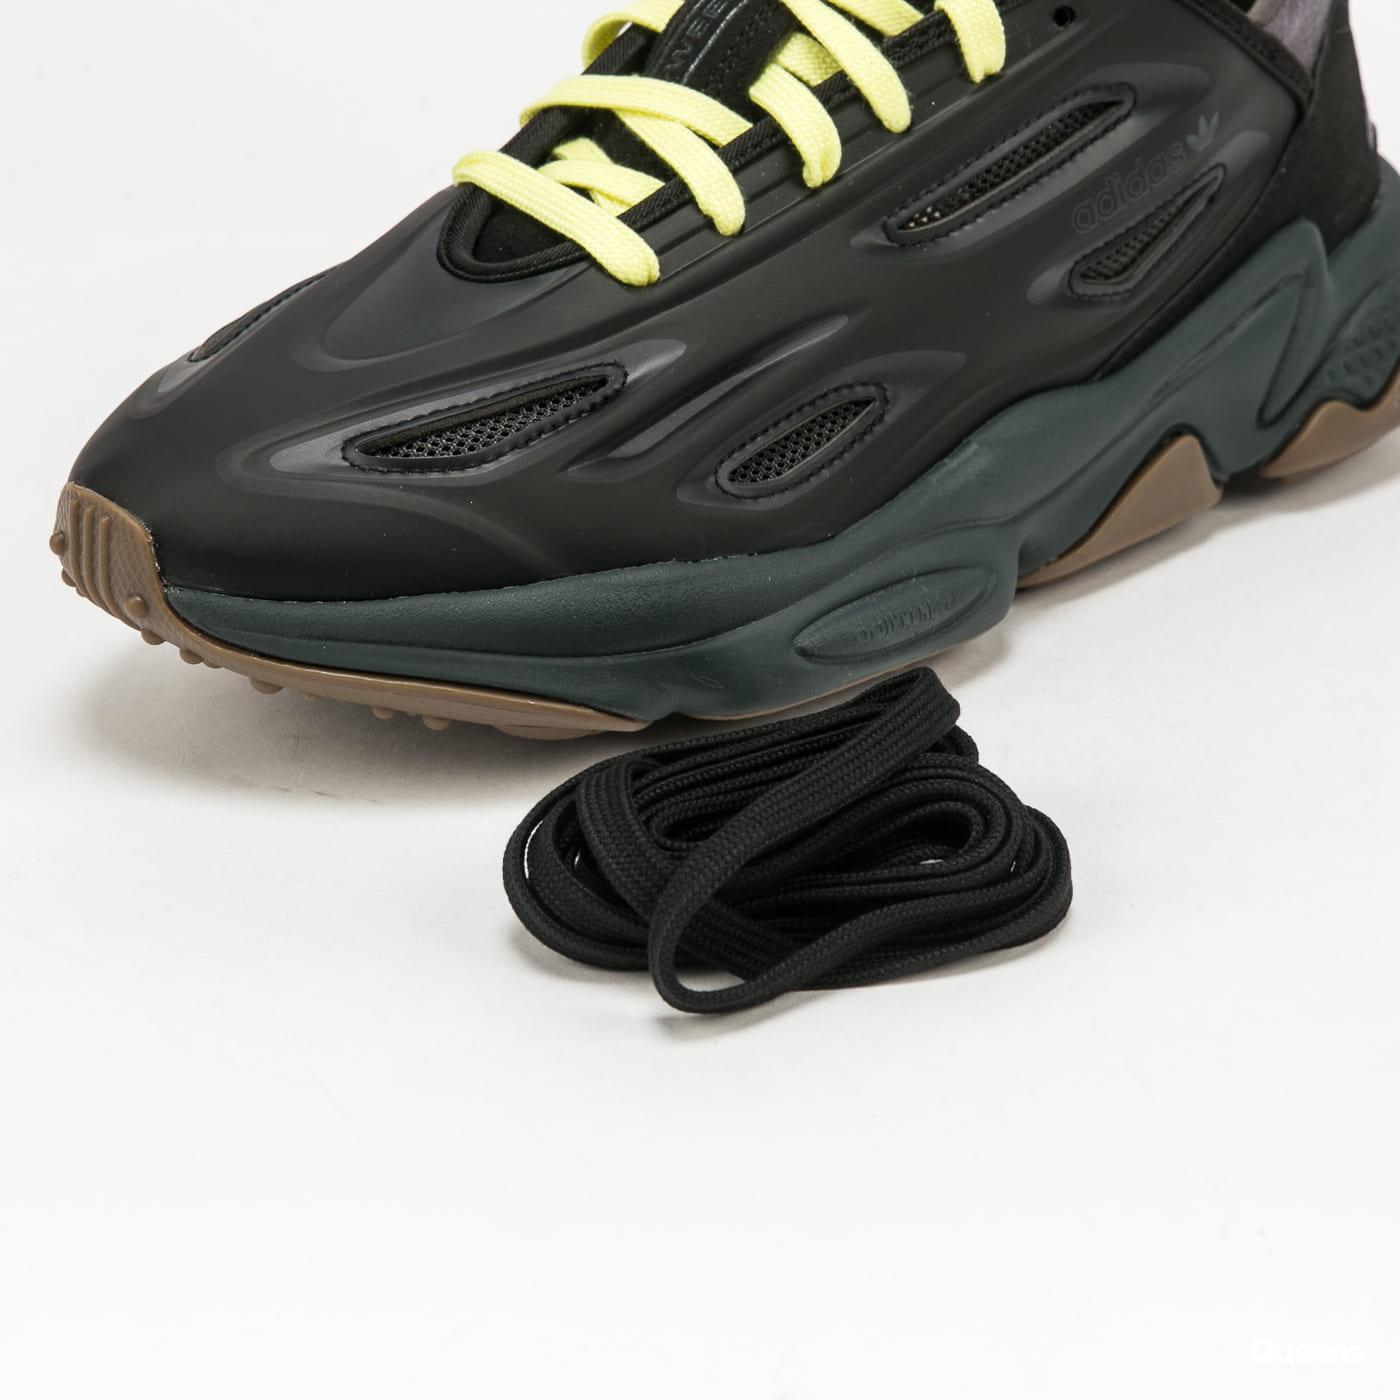 adidas Originals Ozweego Celox cblack / cblack / pulyel